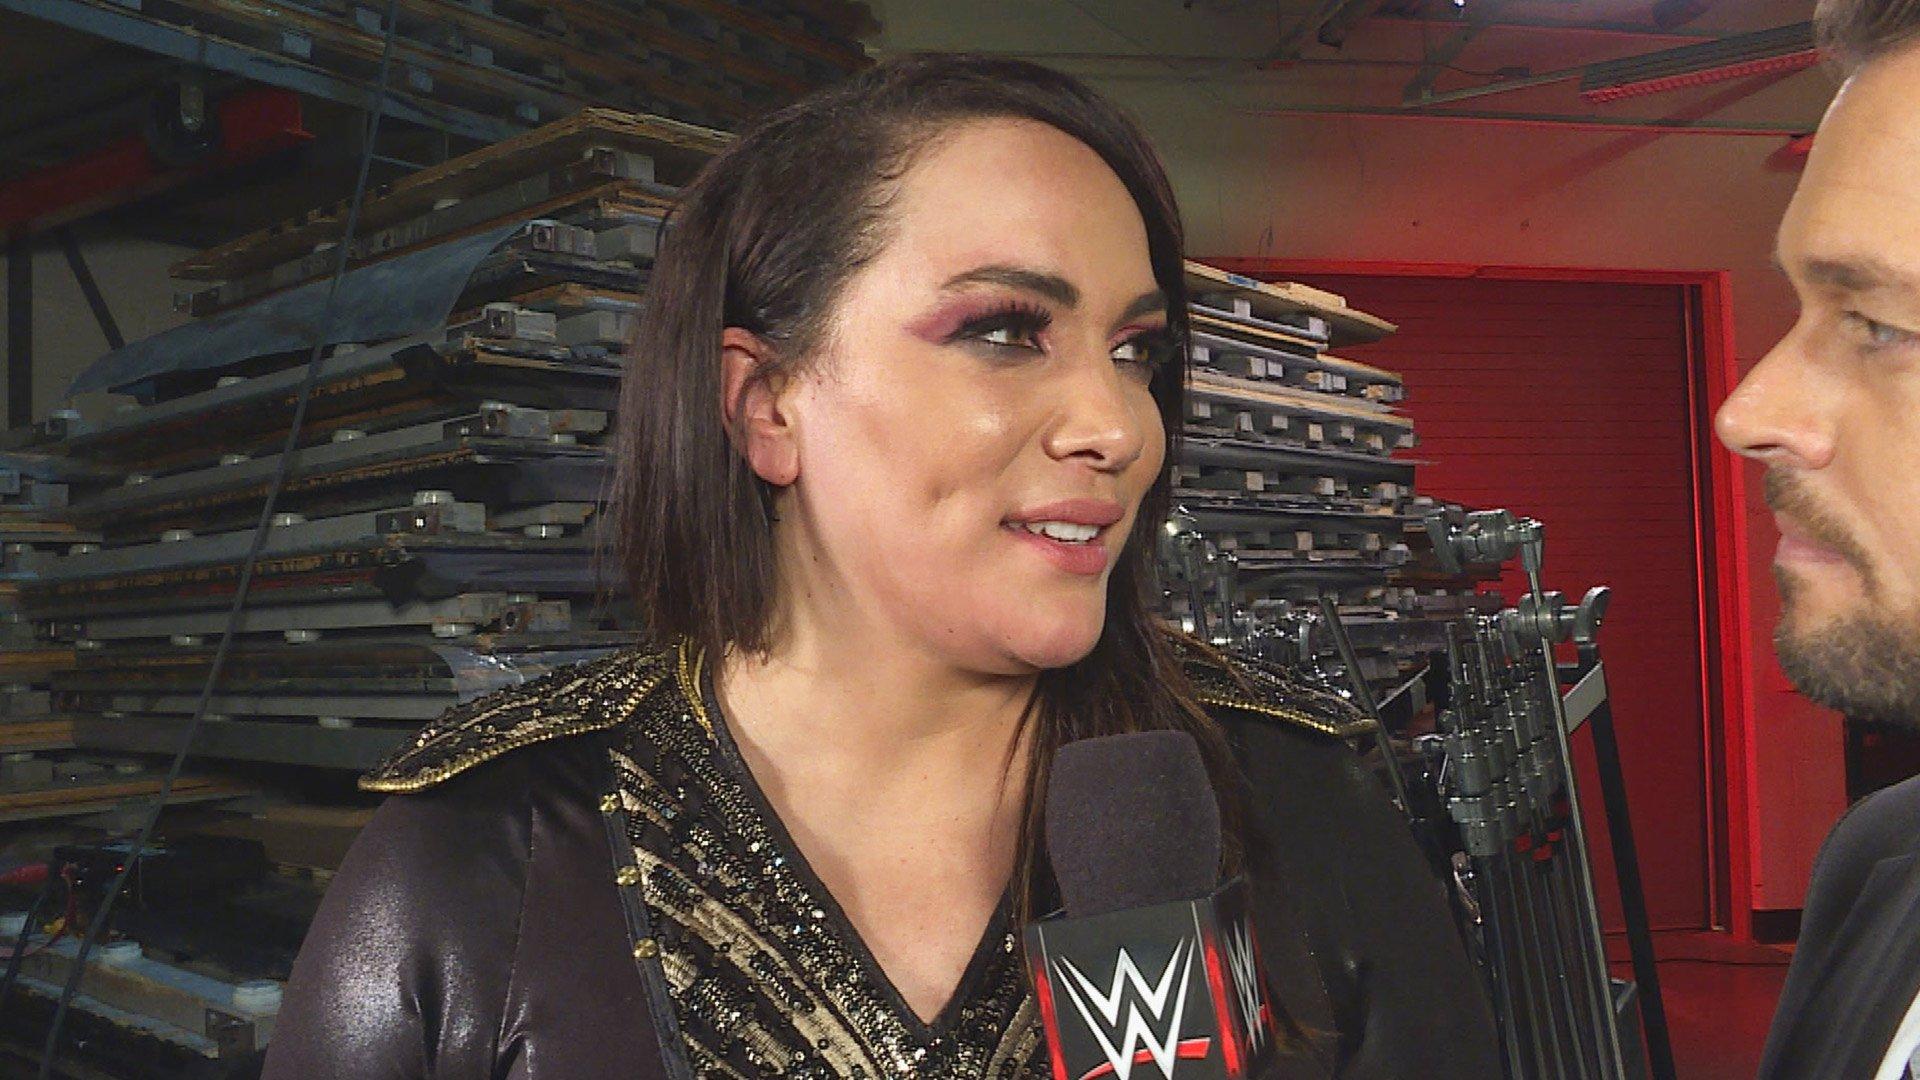 Nia Jax est prête à dominer la division féminine de Raw à WrestleMania: WWE.com Exclusive, 20 mars 2017